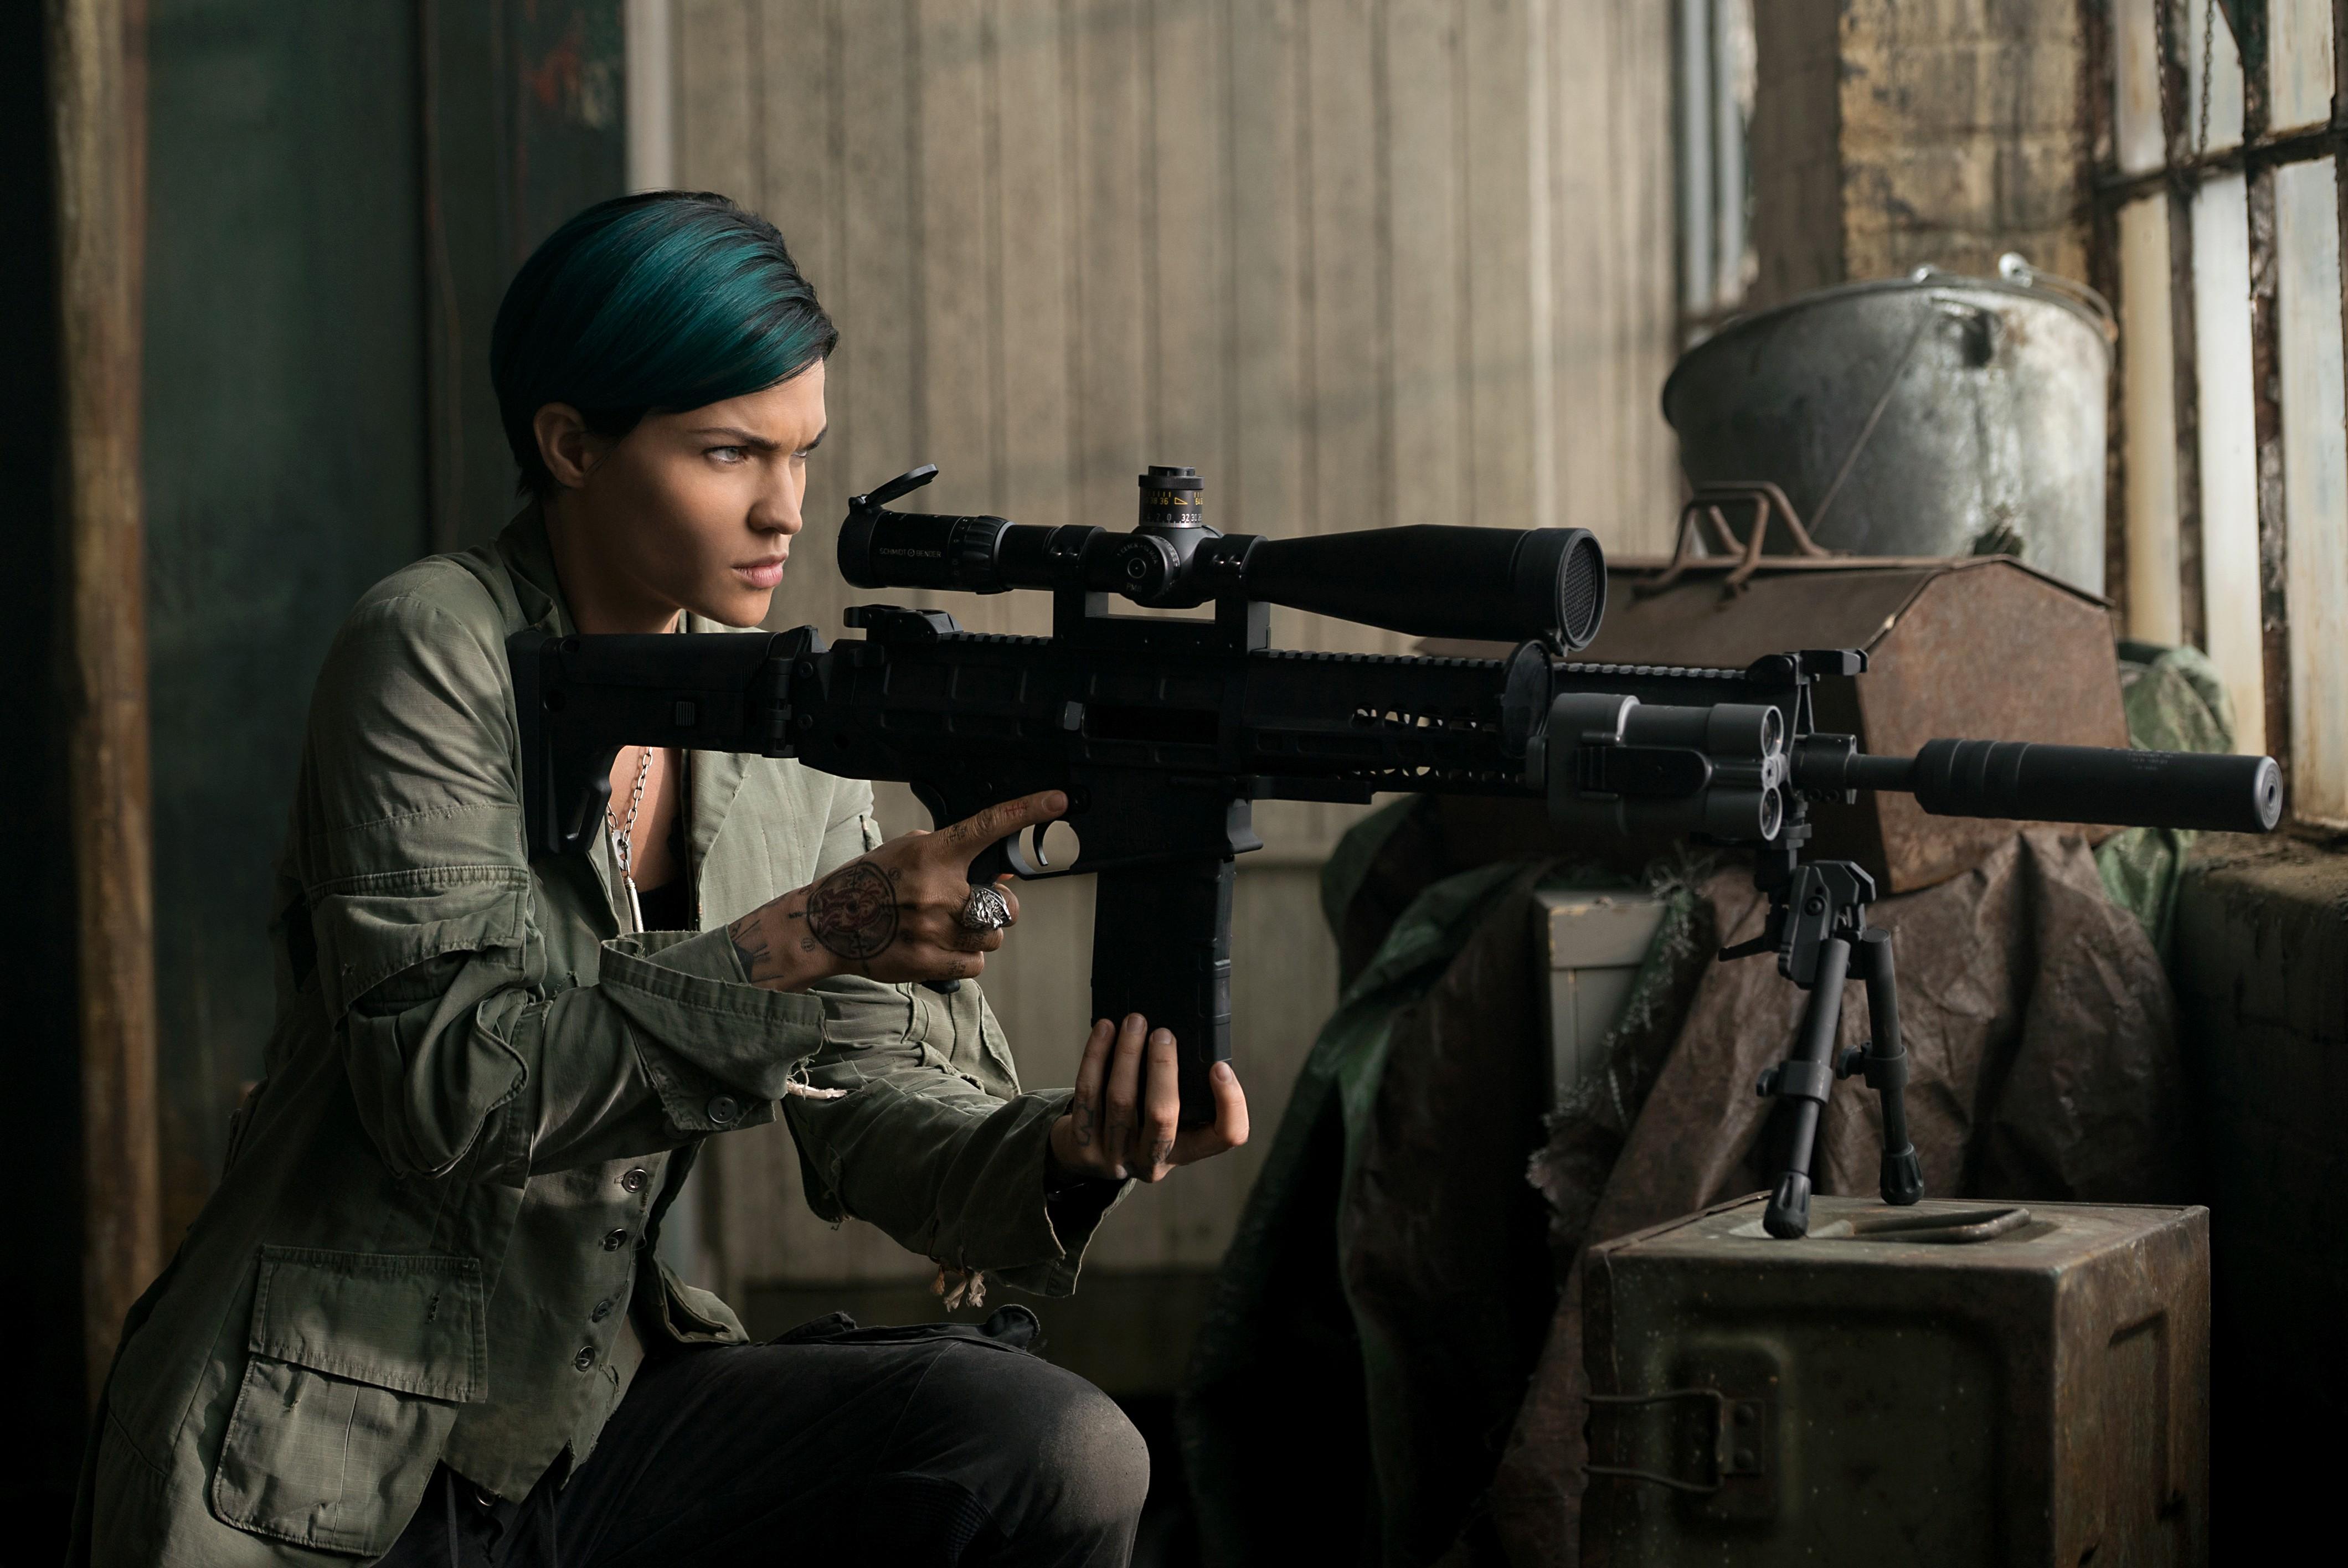 Снайпер 2 смотреть онлайн, Снайперсмотреть онлайн бесплатно в HD 17 фотография